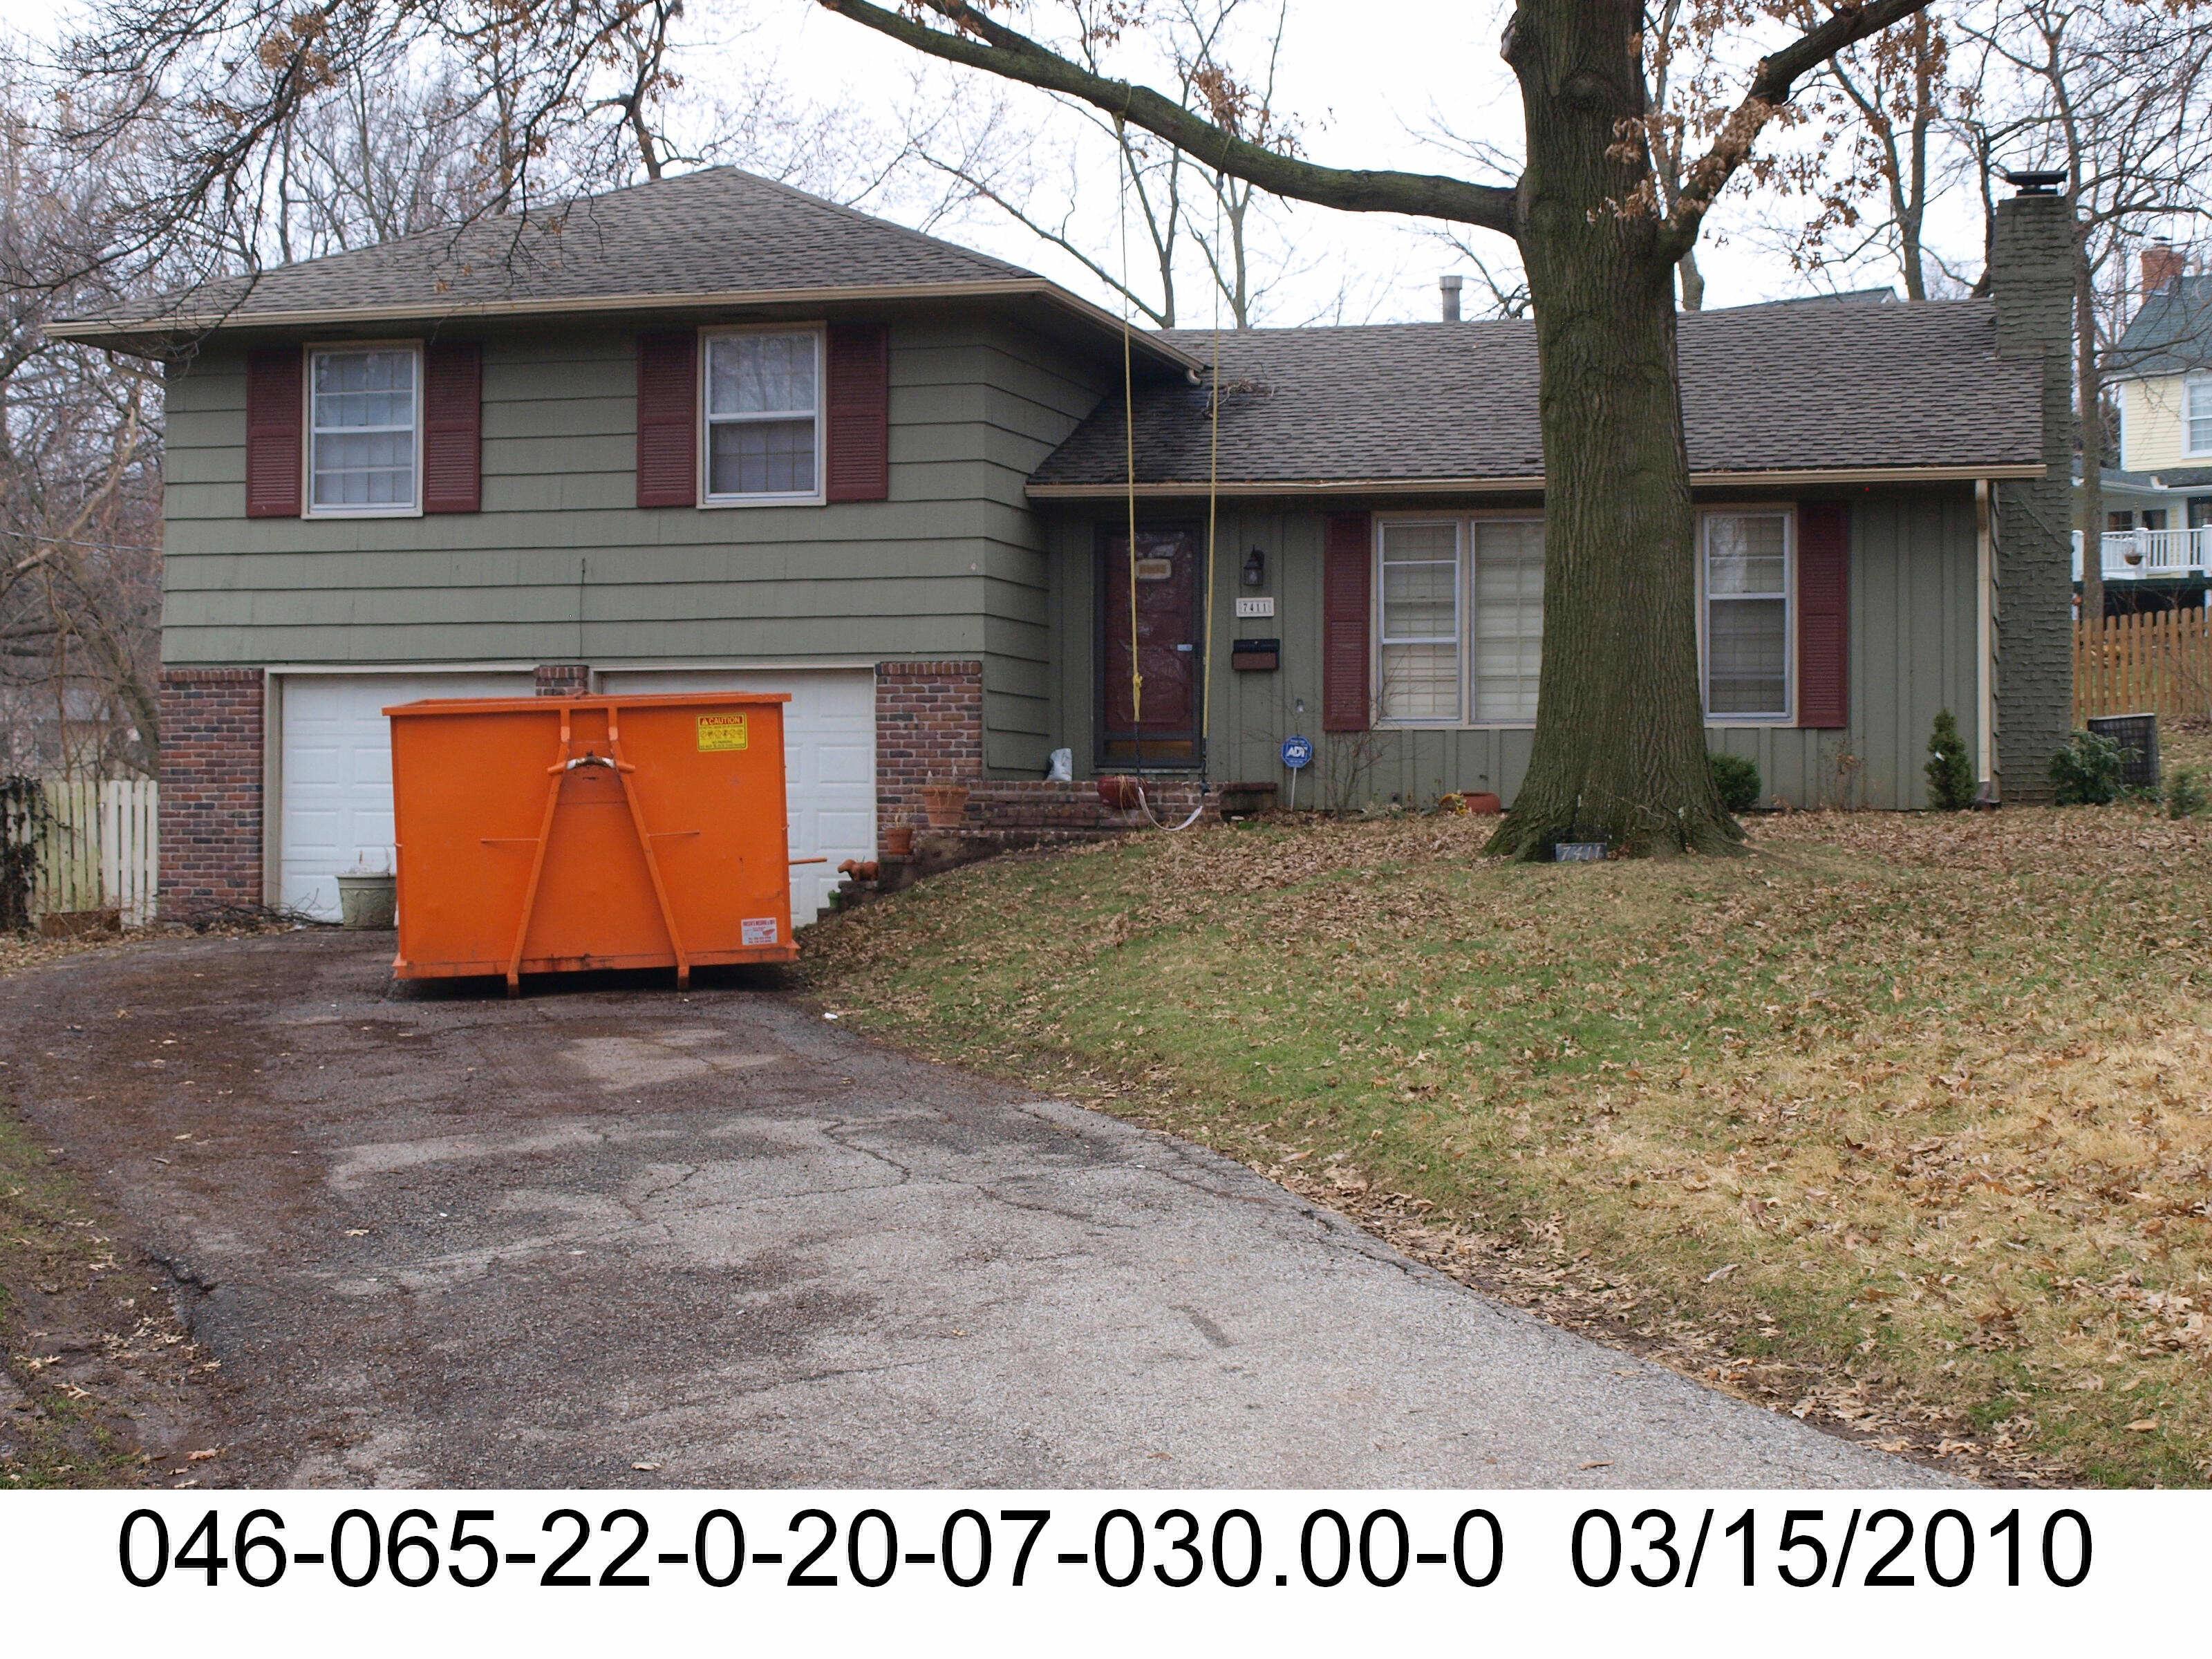 Kansas johnson county prairie village -  183 517 Property In Prairie Village Kansas